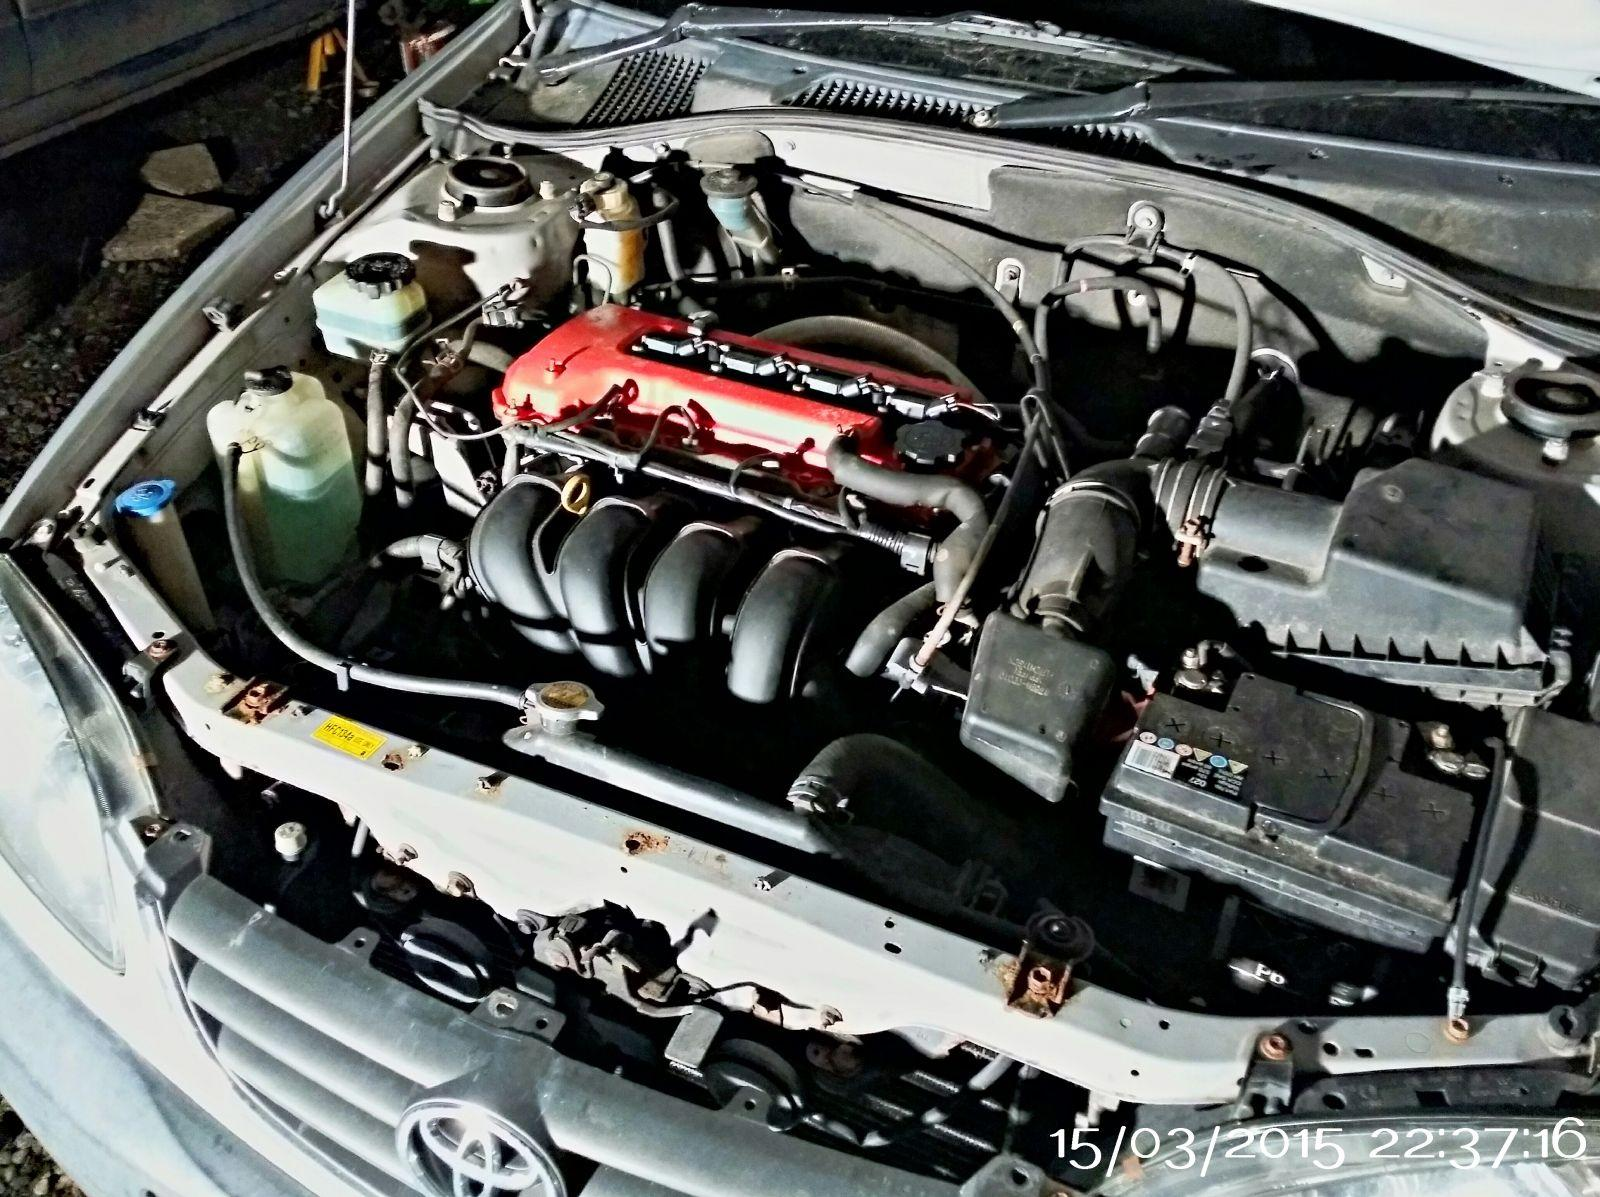 fastbob's motor